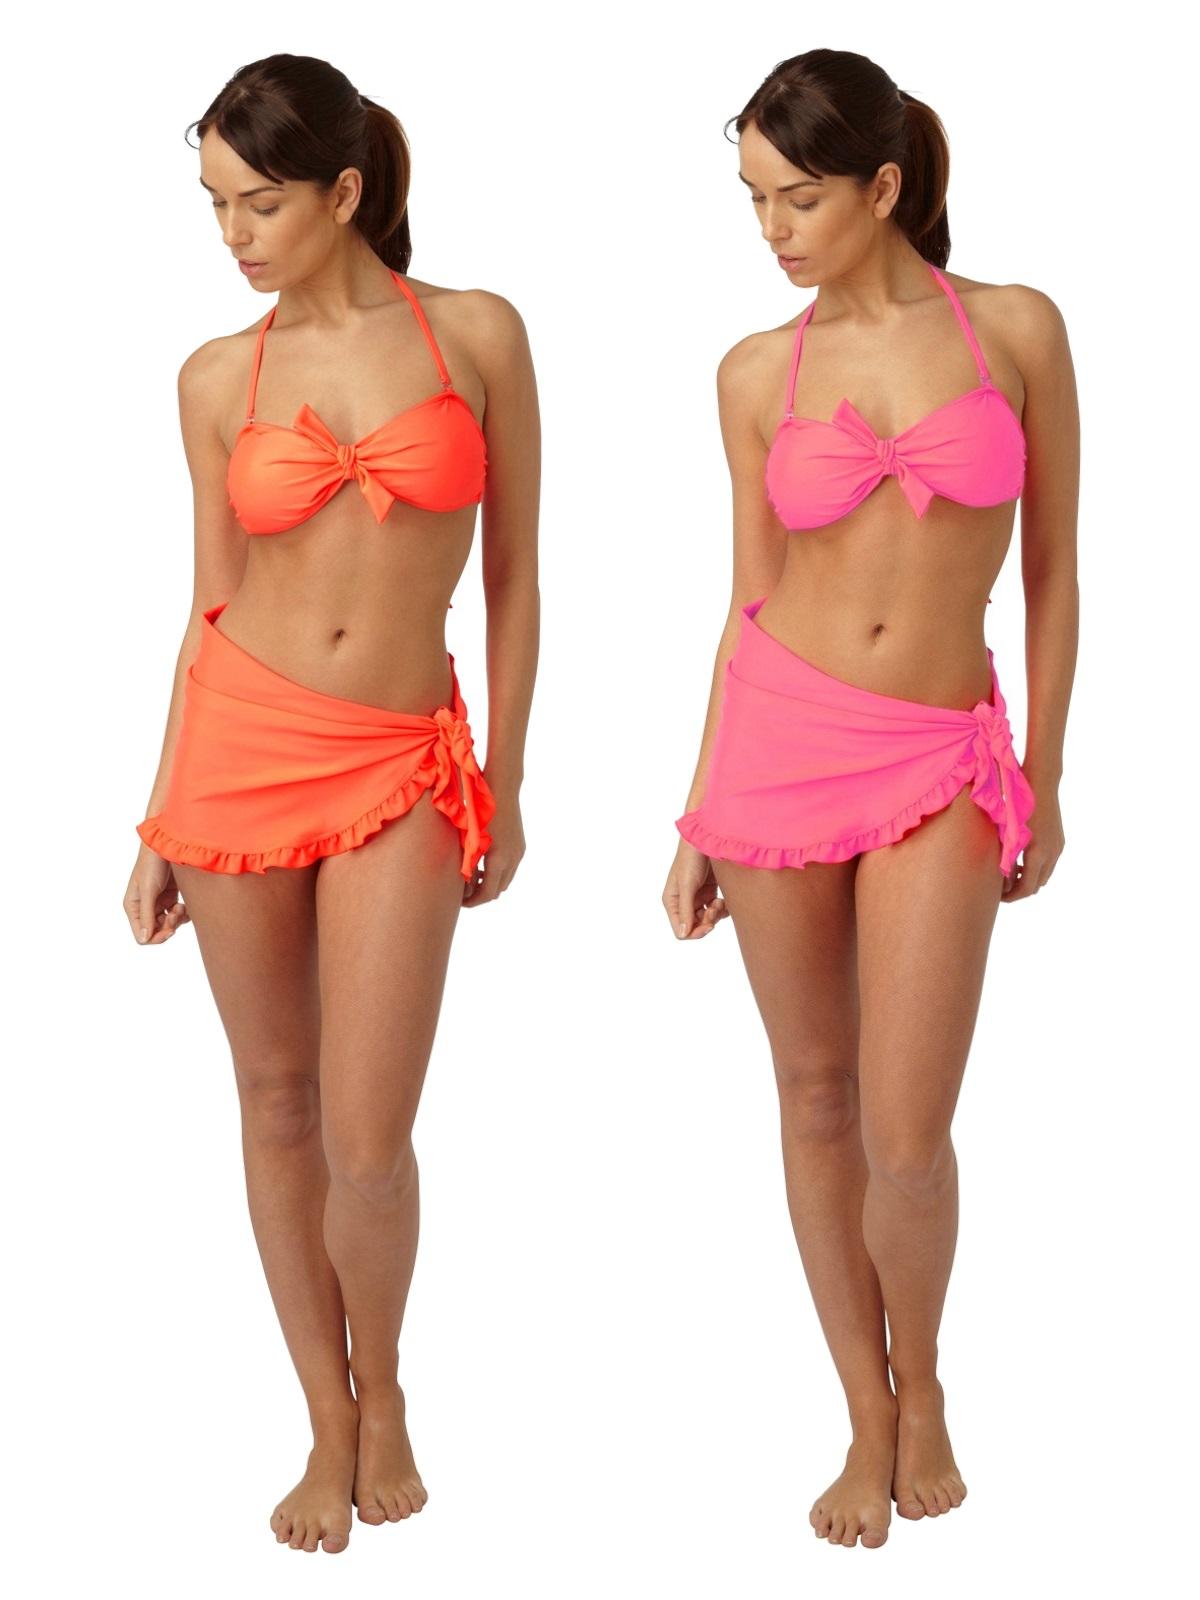 90956eac98c Womens Neon Bikini Set Top + Bottoms + Sarong/Skirt Ladies Swimwear Size  10-16